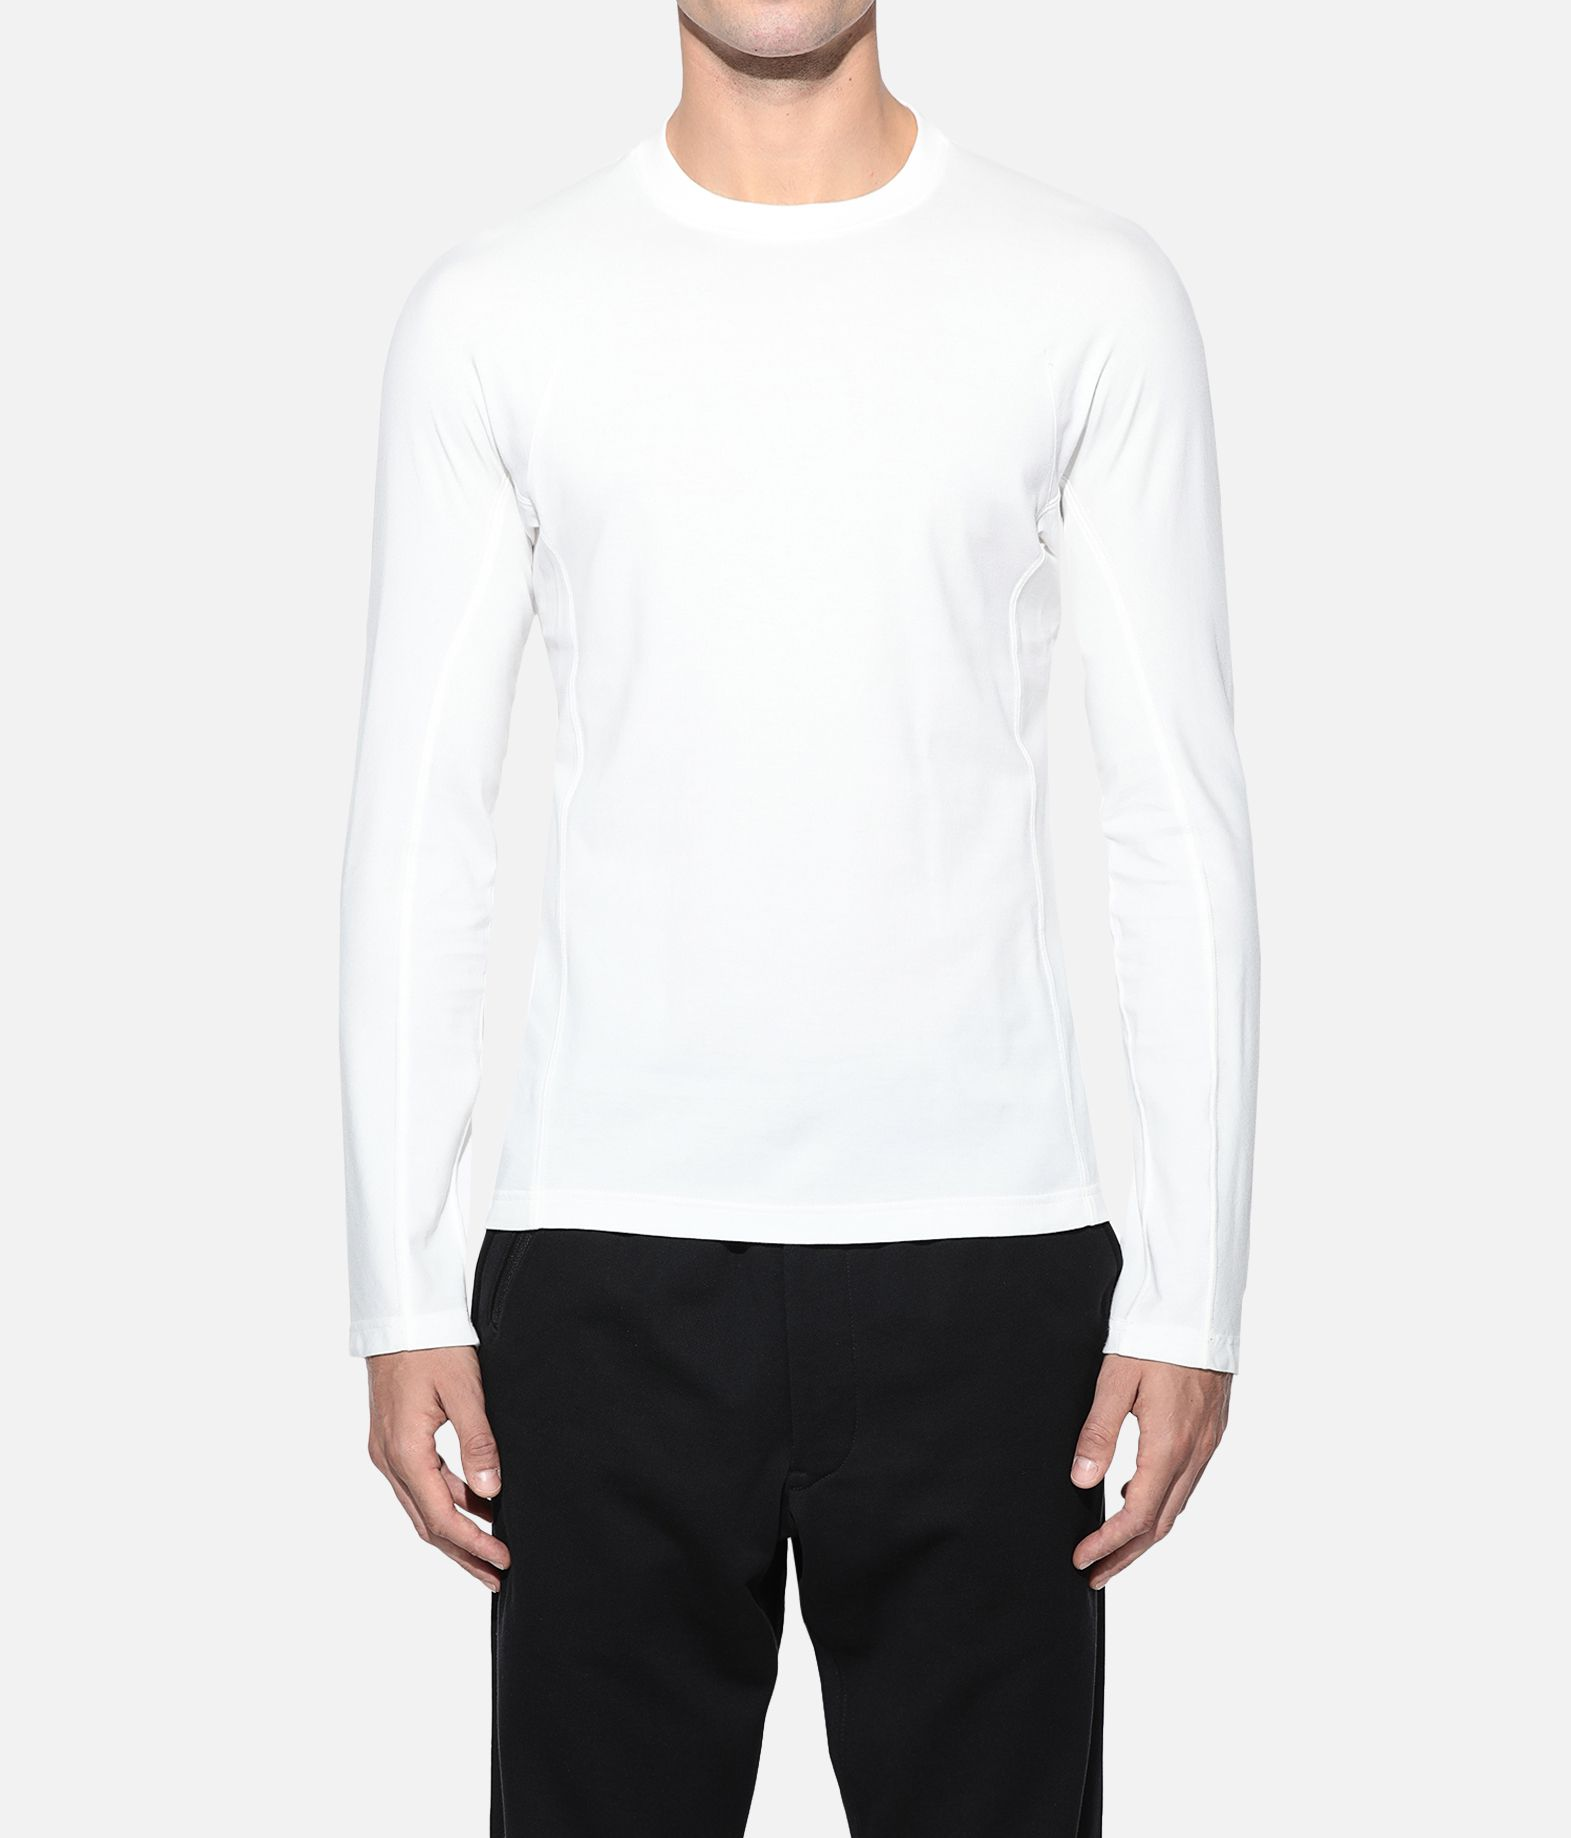 Y-3 Y-3 Classic Tee Langärmliges T-shirt Herren r